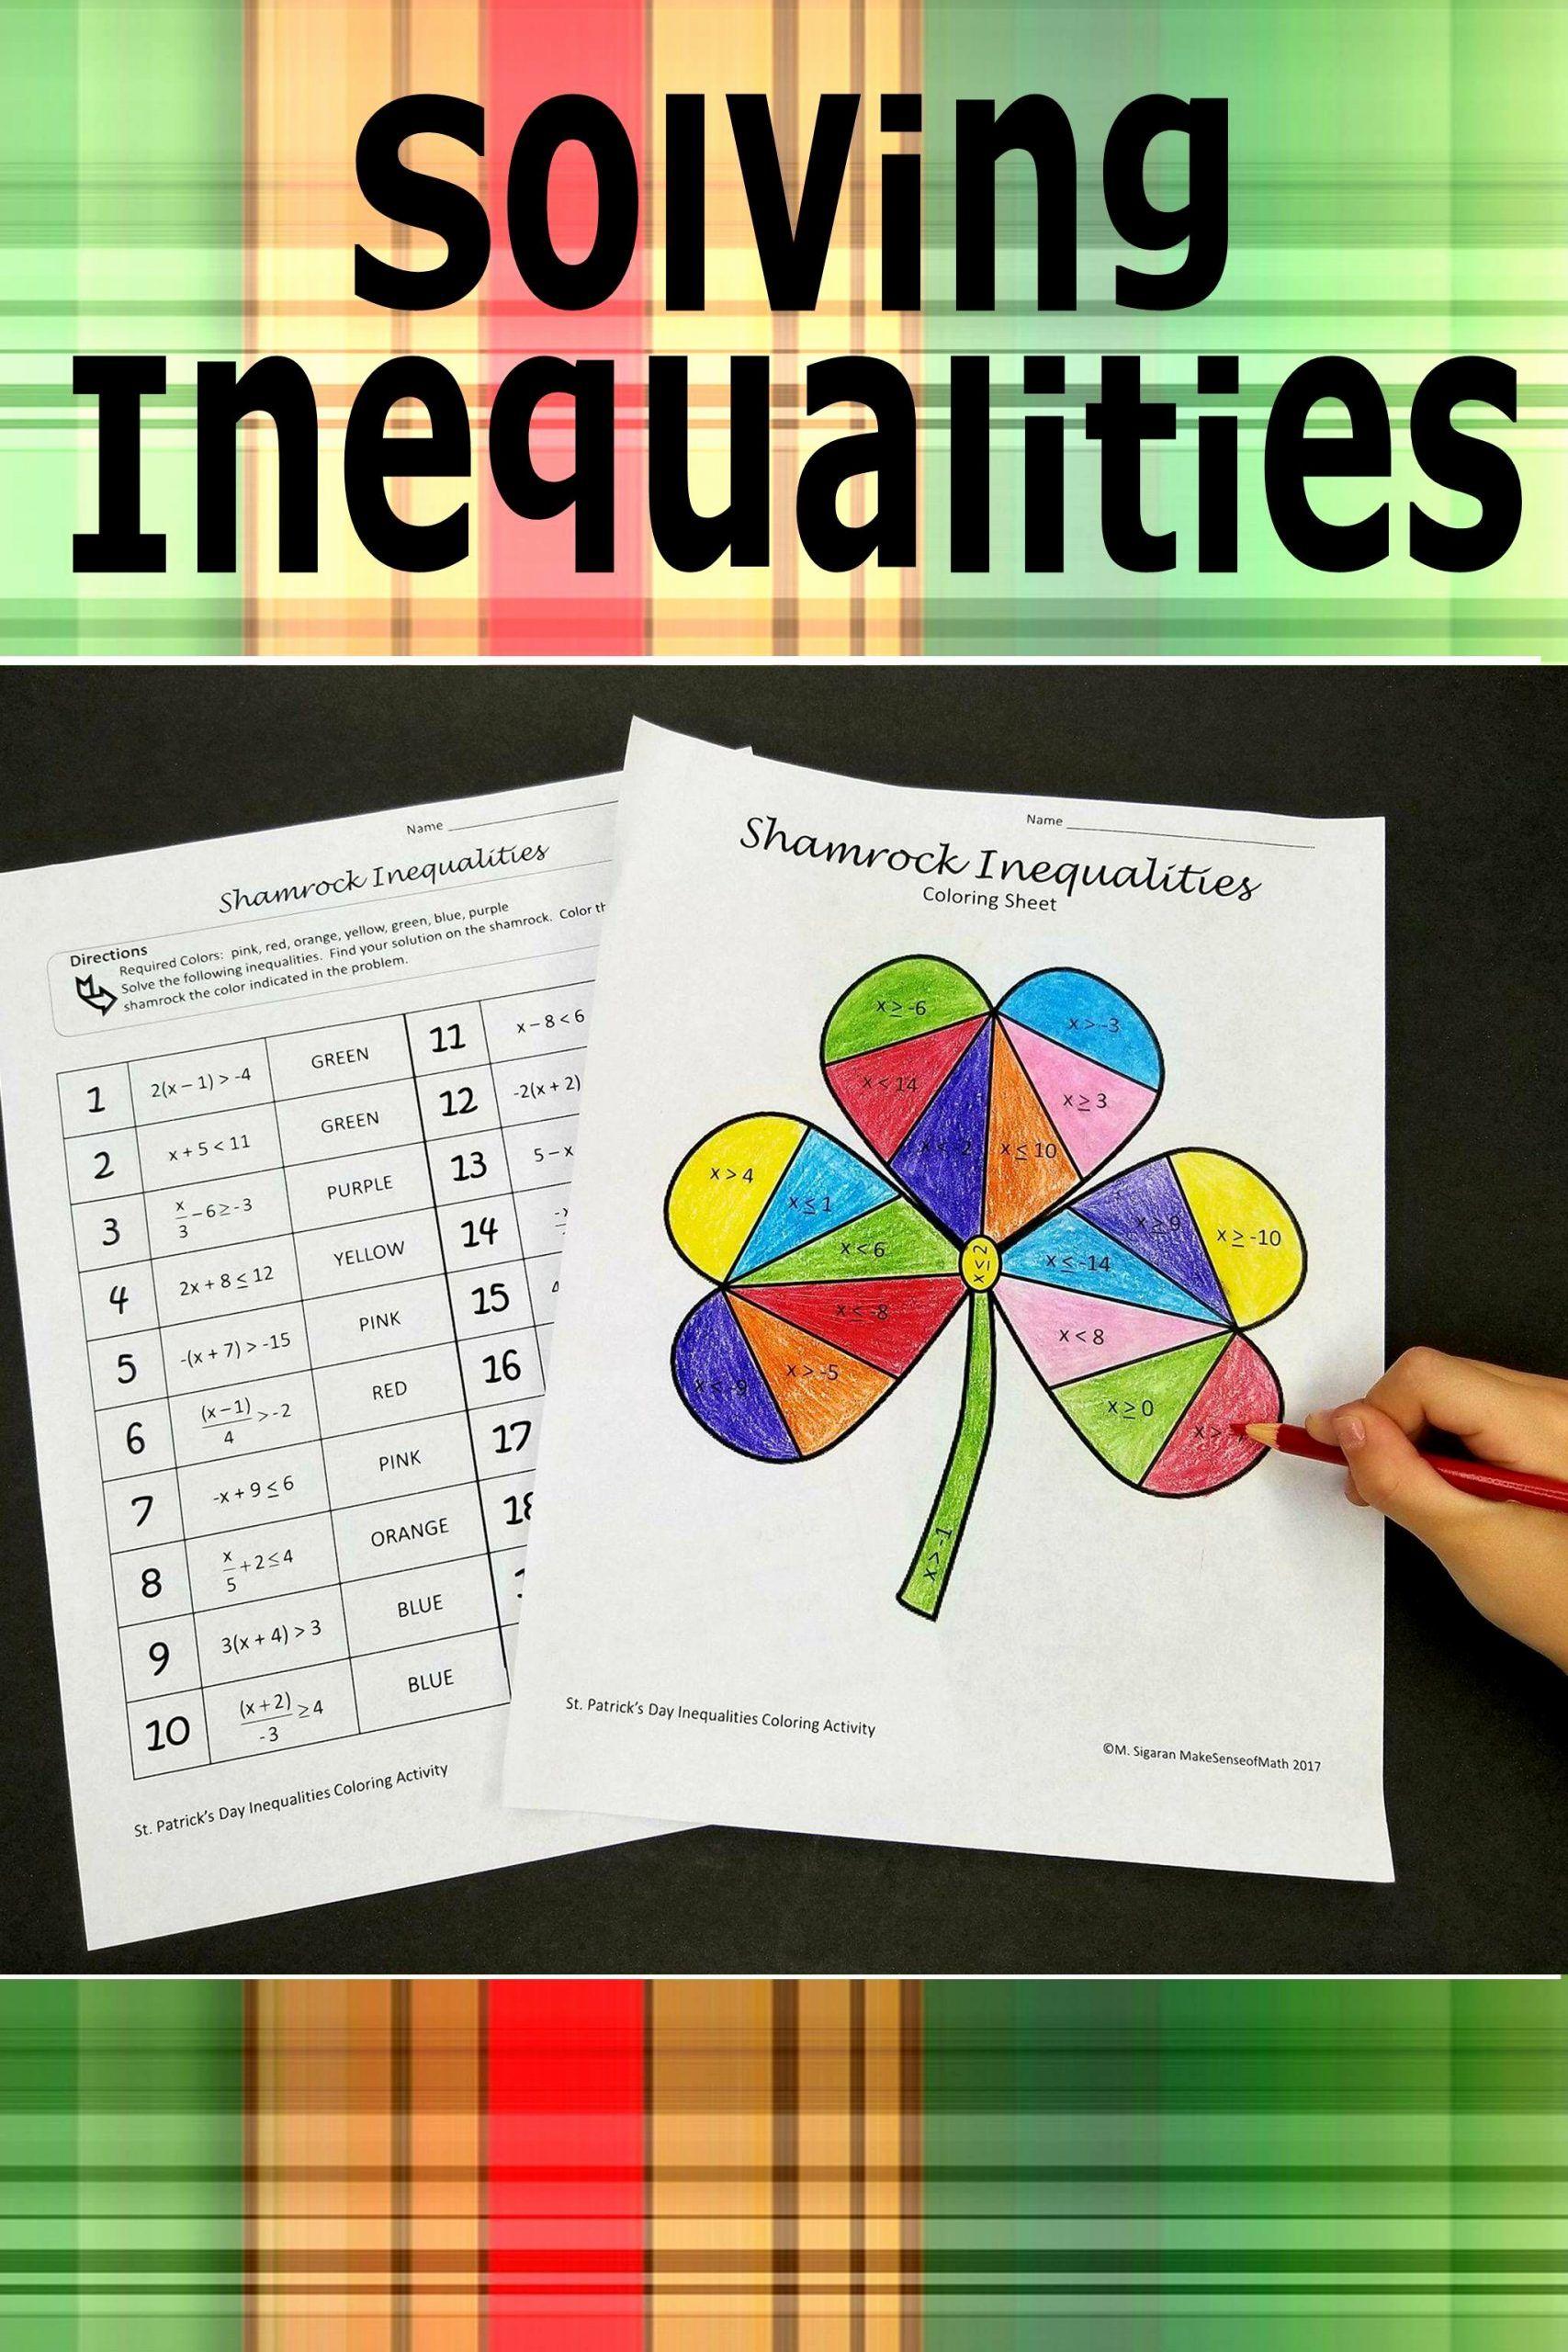 Solving Inequalities Coloring Worksheet Top St Patrick S Day Solving Inequ In 2020 Middle School Math Activities Algebra Maths Activities Middle School Math Activities [ 2560 x 1707 Pixel ]